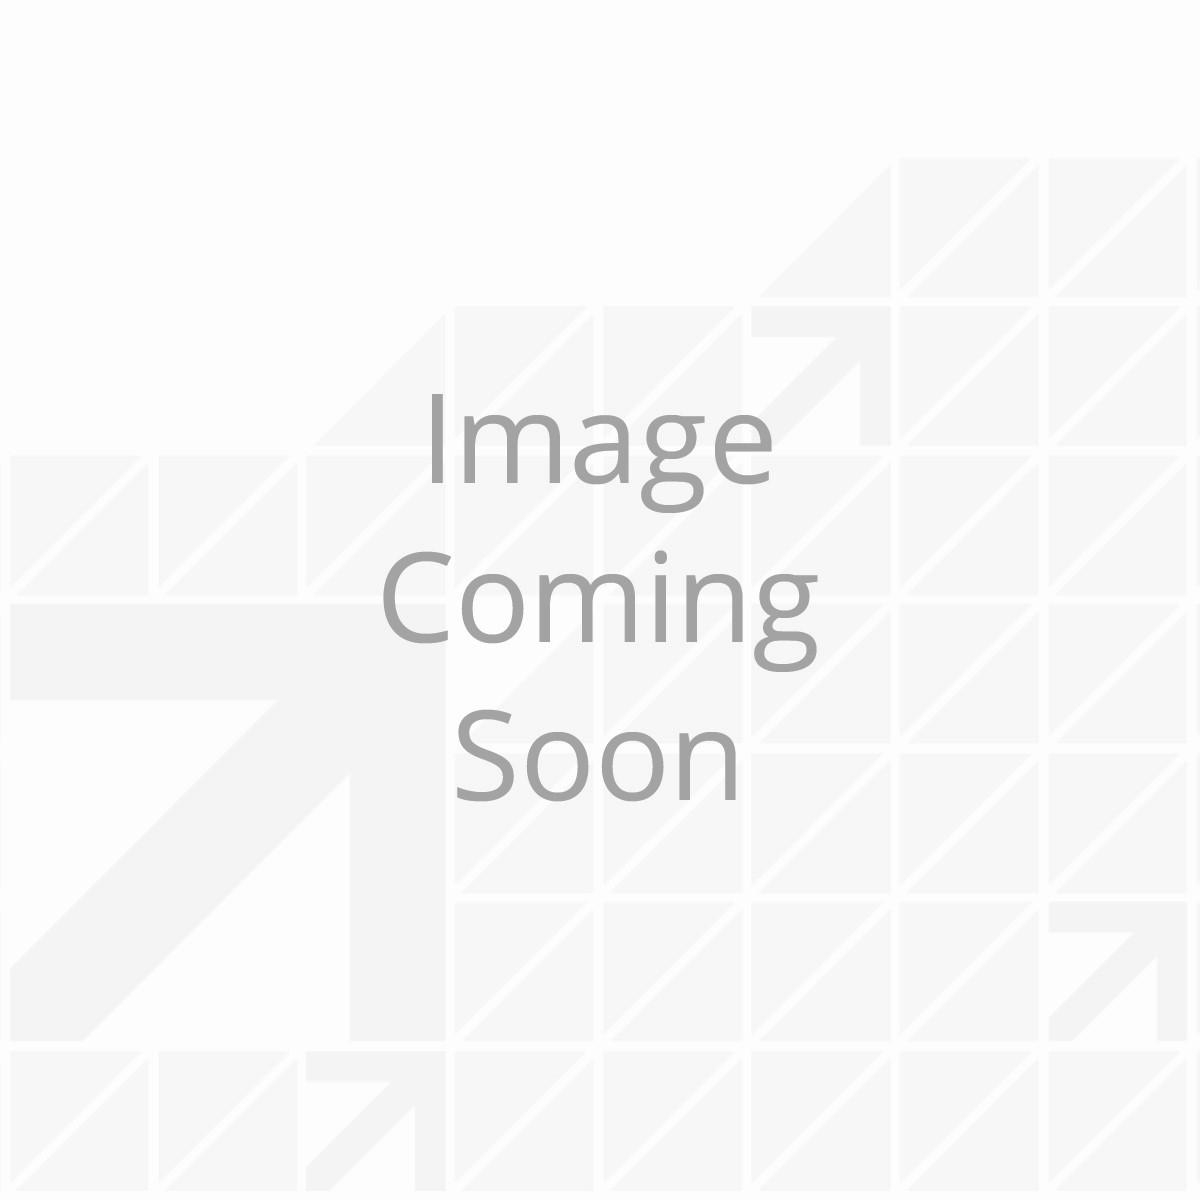 Men's Nike Half Zip in Thunder Grey and Black - Various Sizes